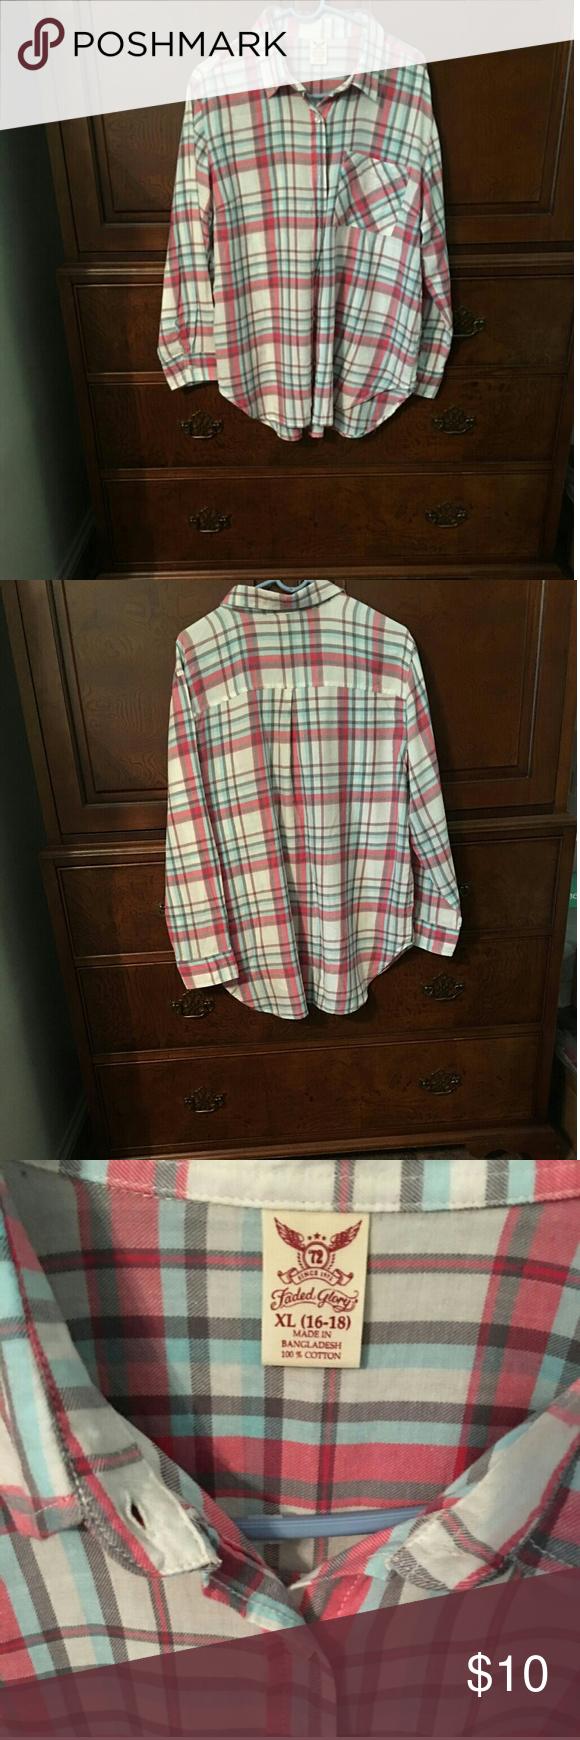 Off white red flannel shirt   for  in   My Posh Picks  Pinterest  White light shades